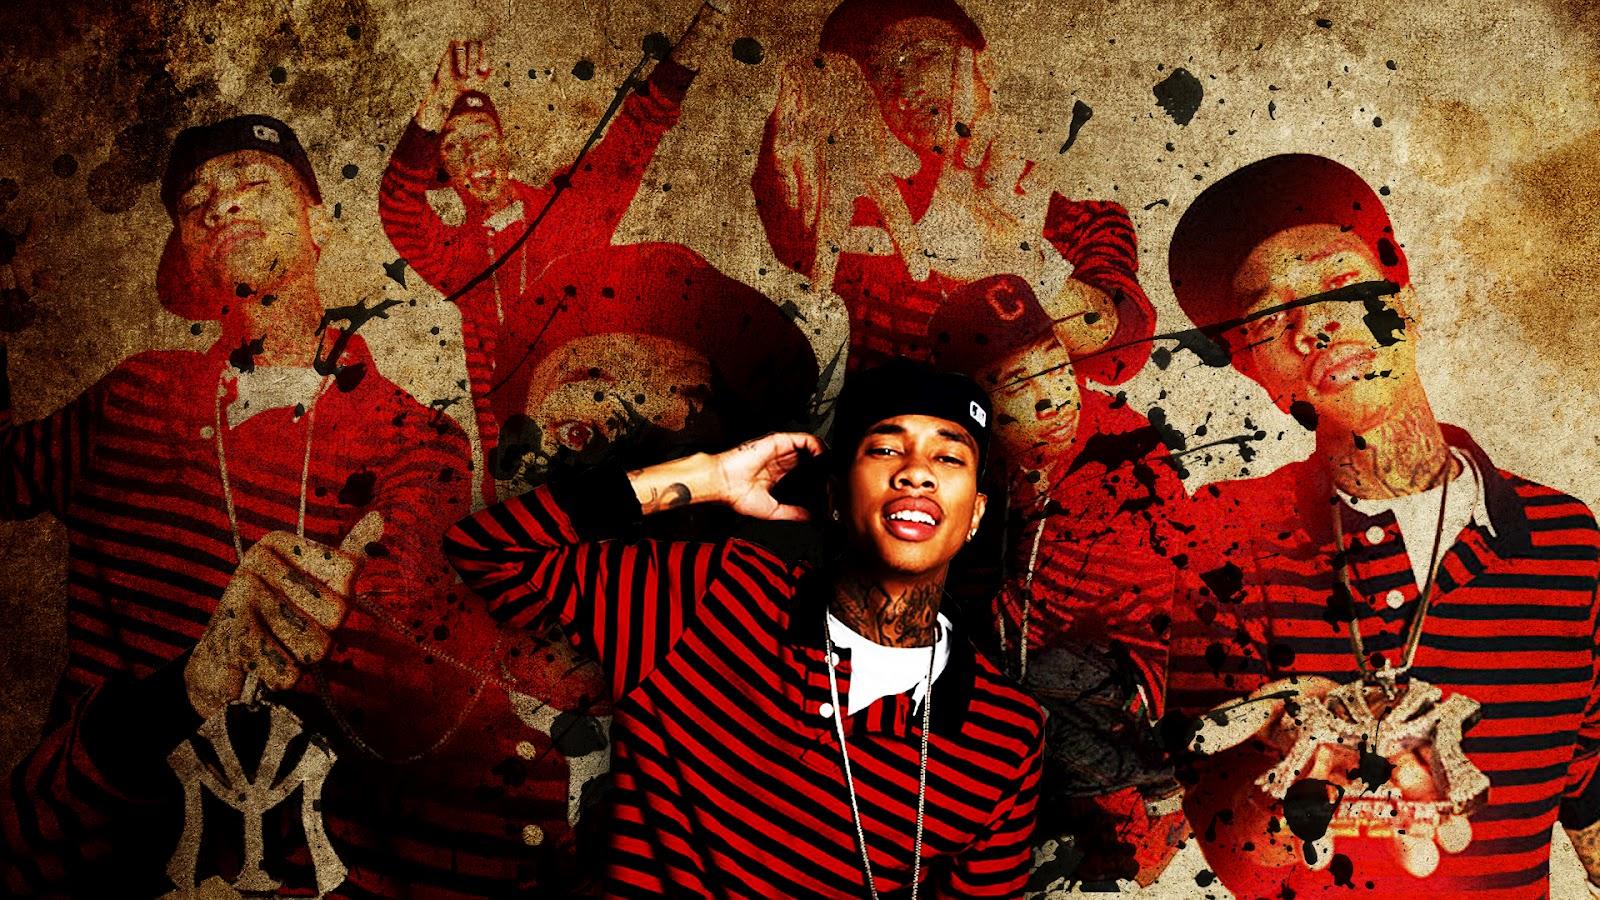 pic new posts: B.o.b Rapper Wallpaper